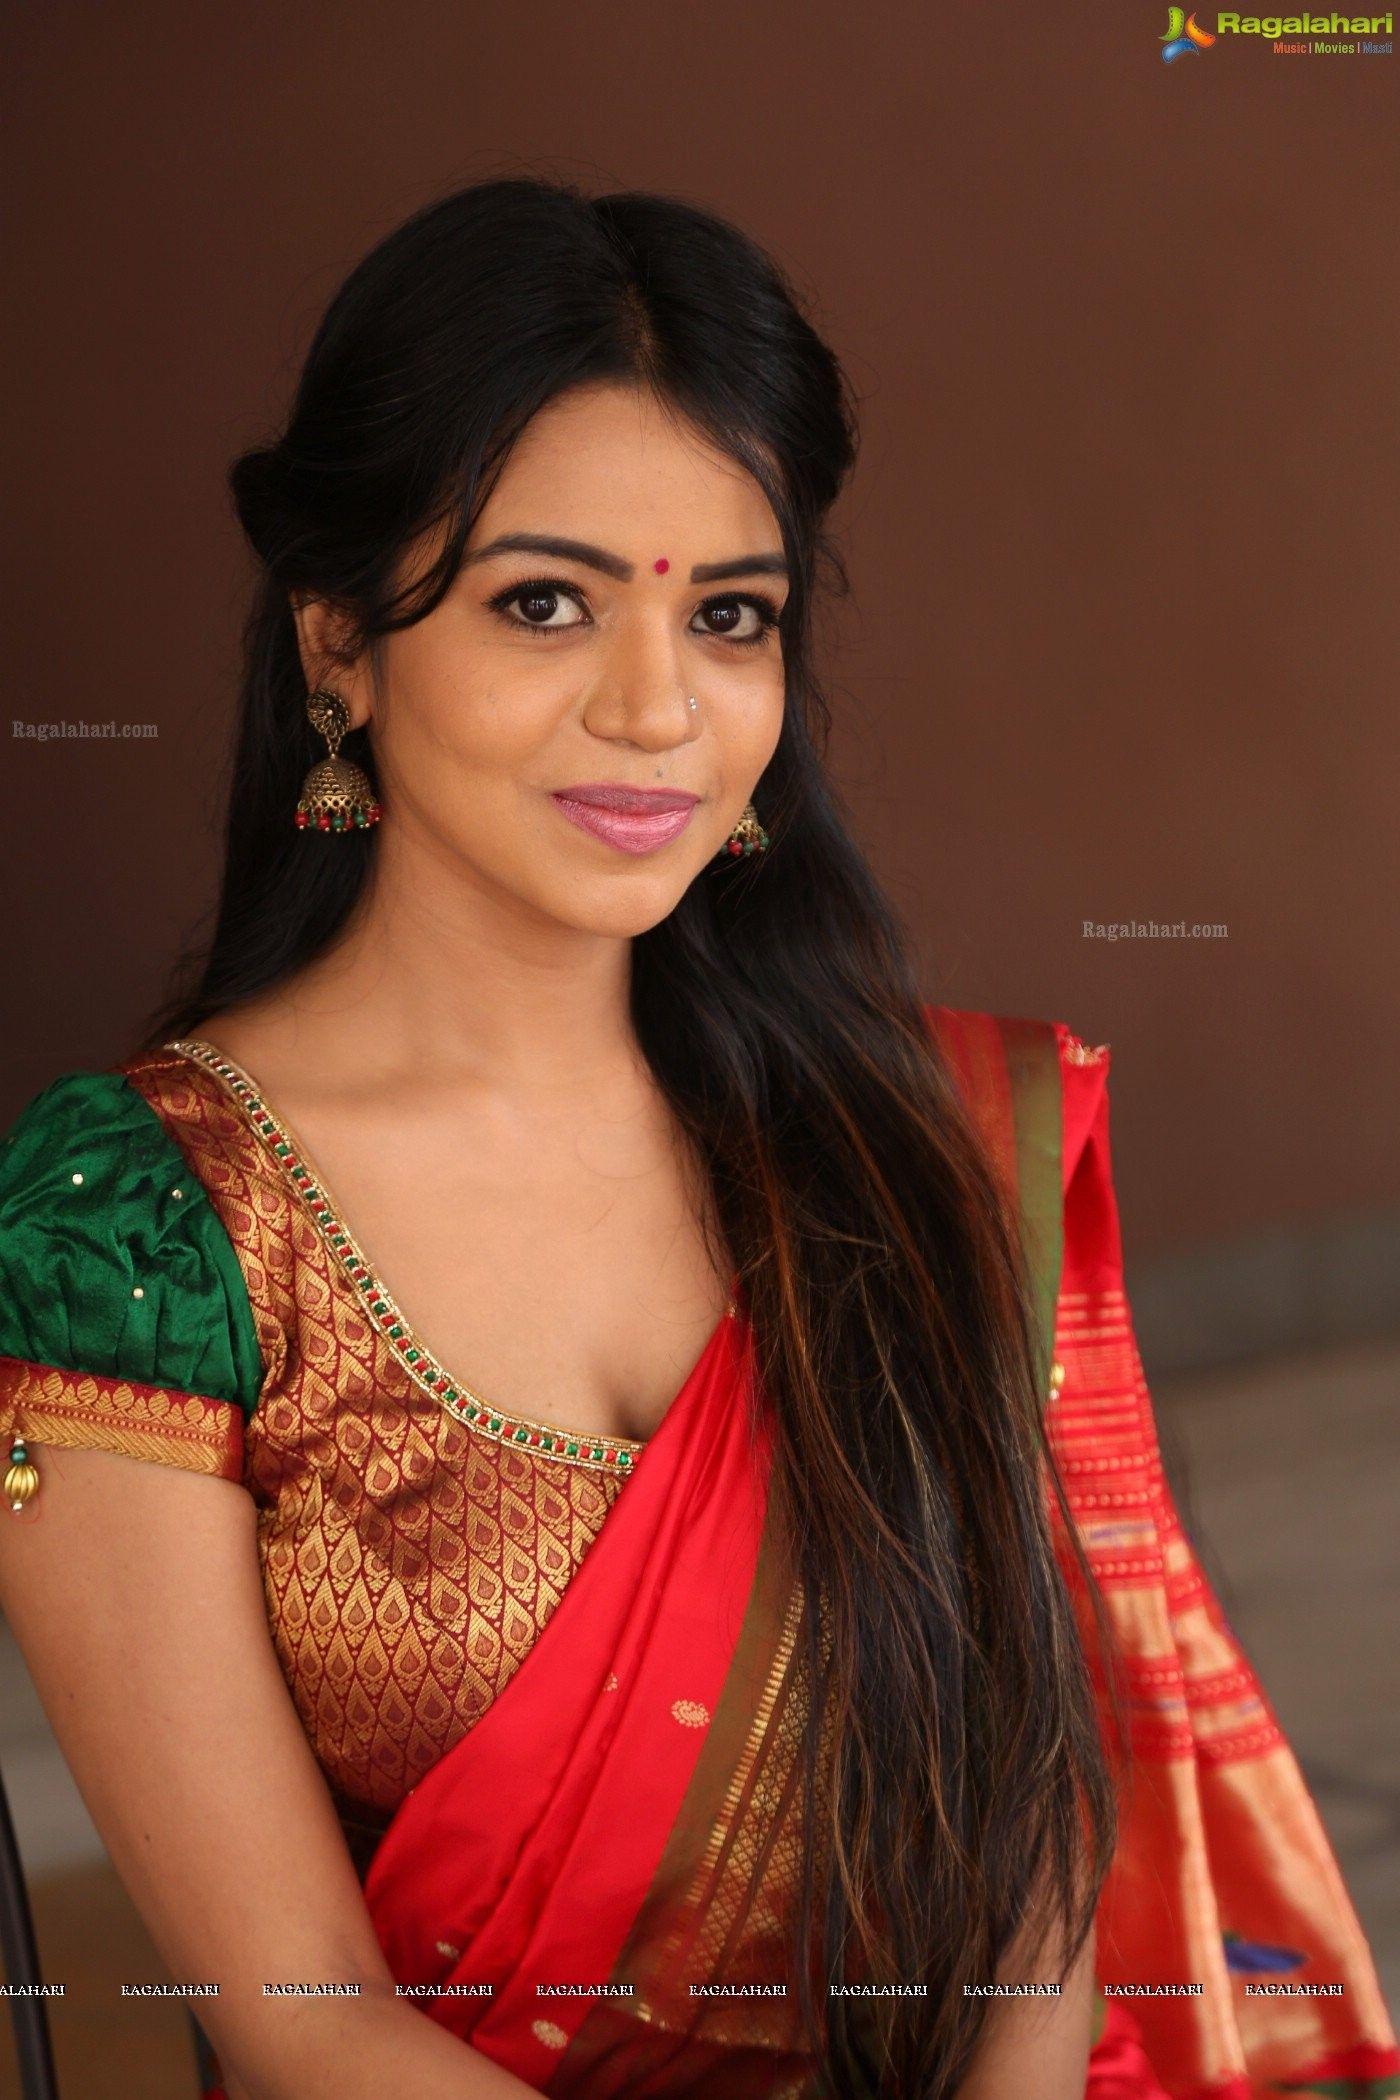 Pin By Ashish A On Hot Cute South Indian Actress Hot Hollywood Top Actress Actresses